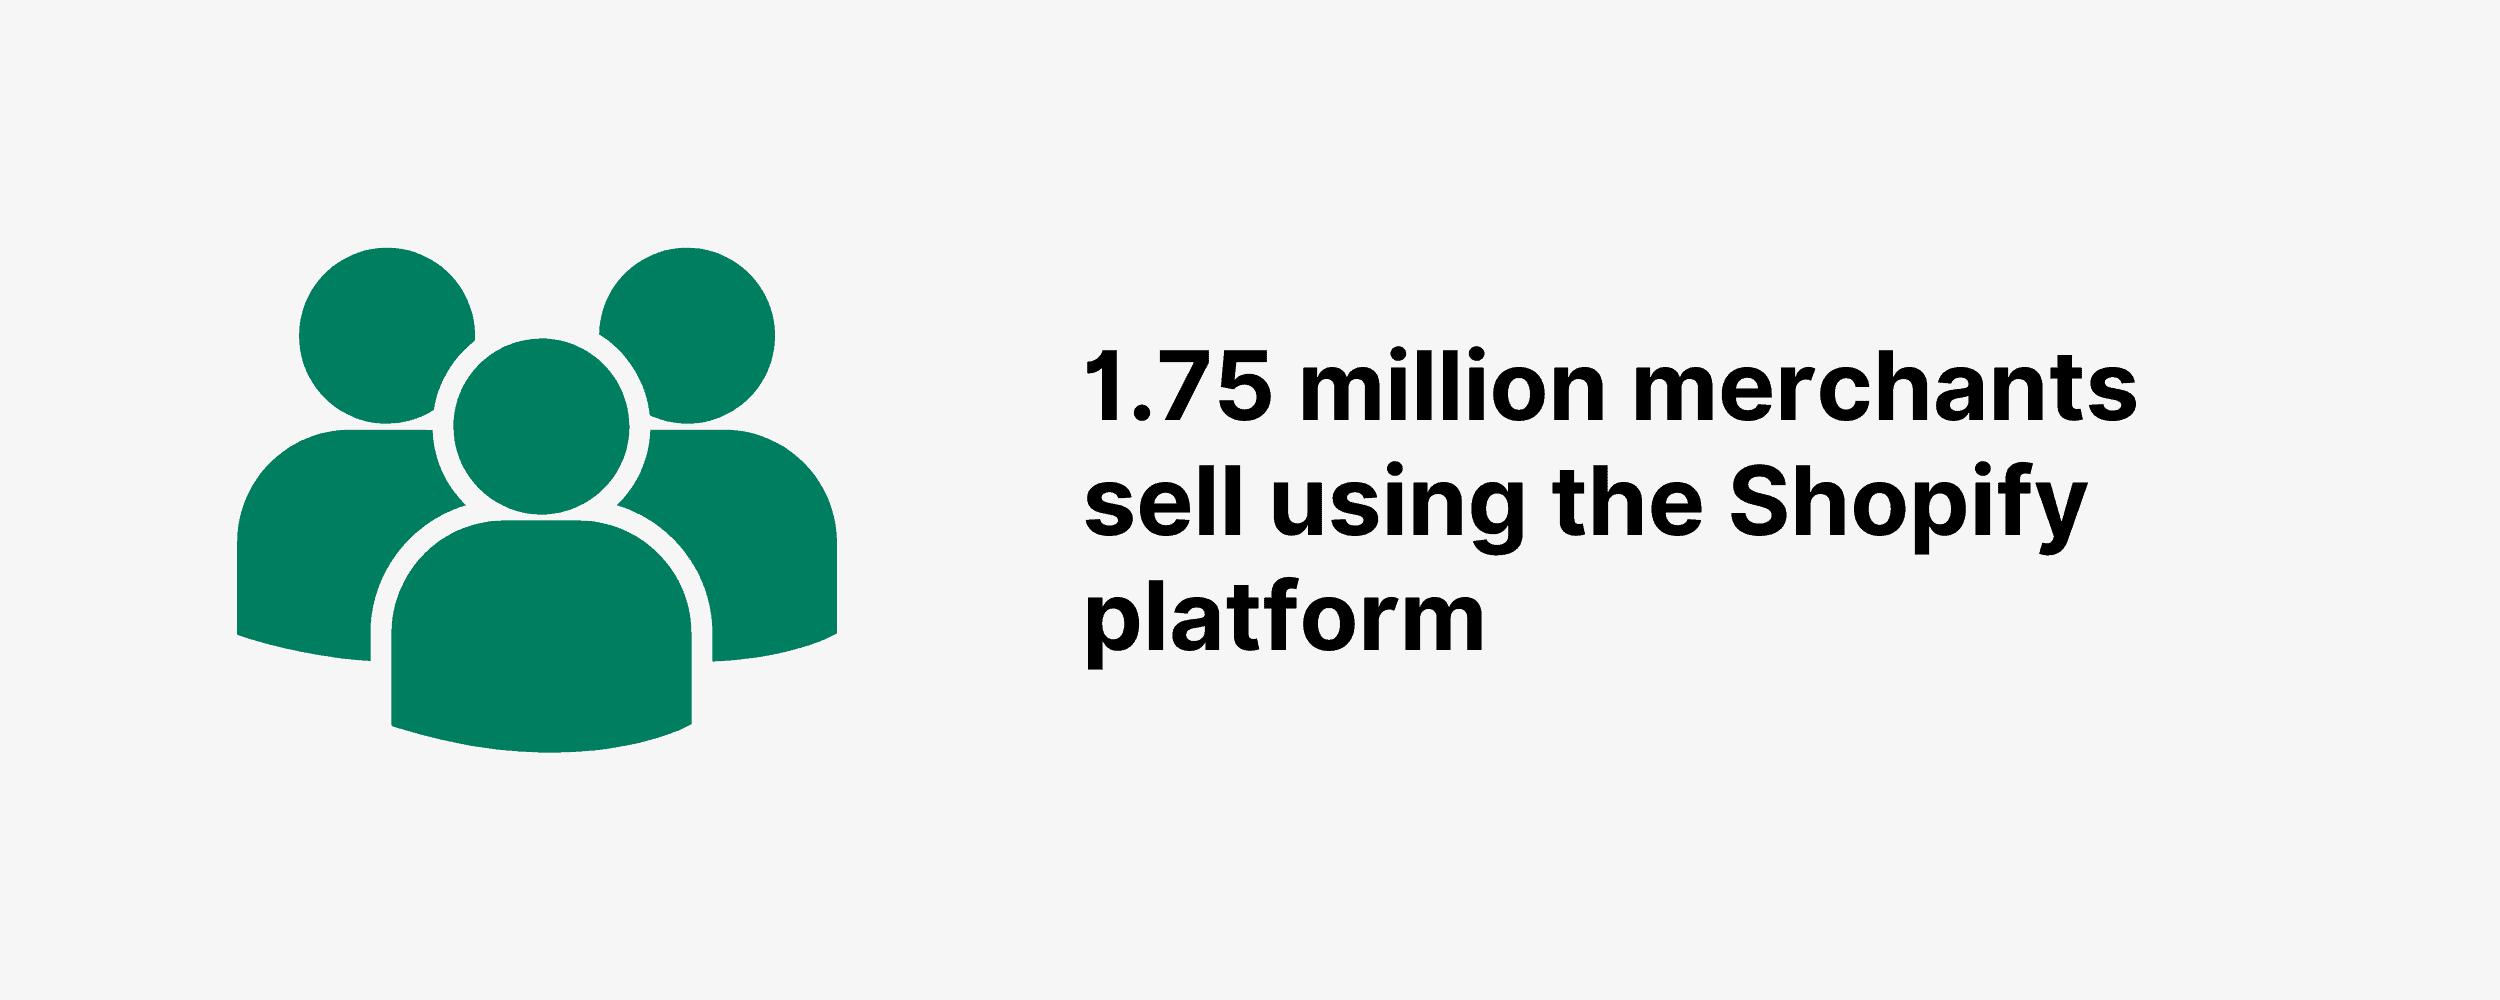 1.75 million merchants sell using the Shopify platform